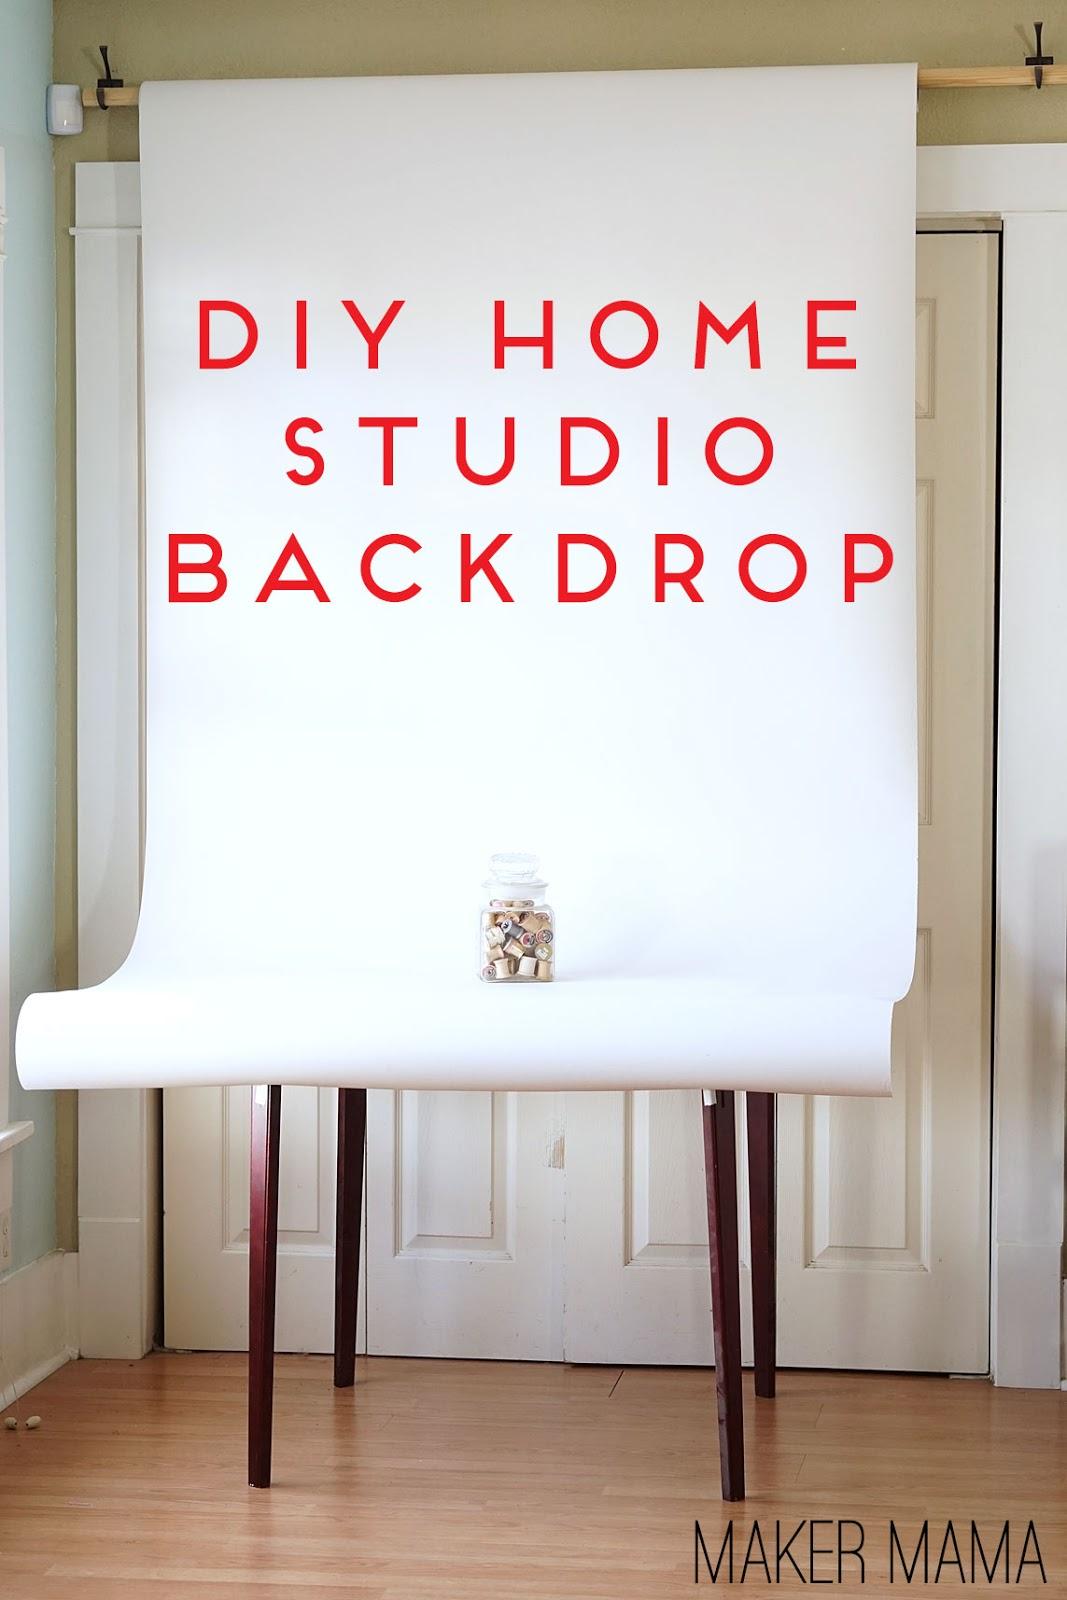 House Plan Maker Maker Mama Craft Blog Diy Home Studio Backdrop